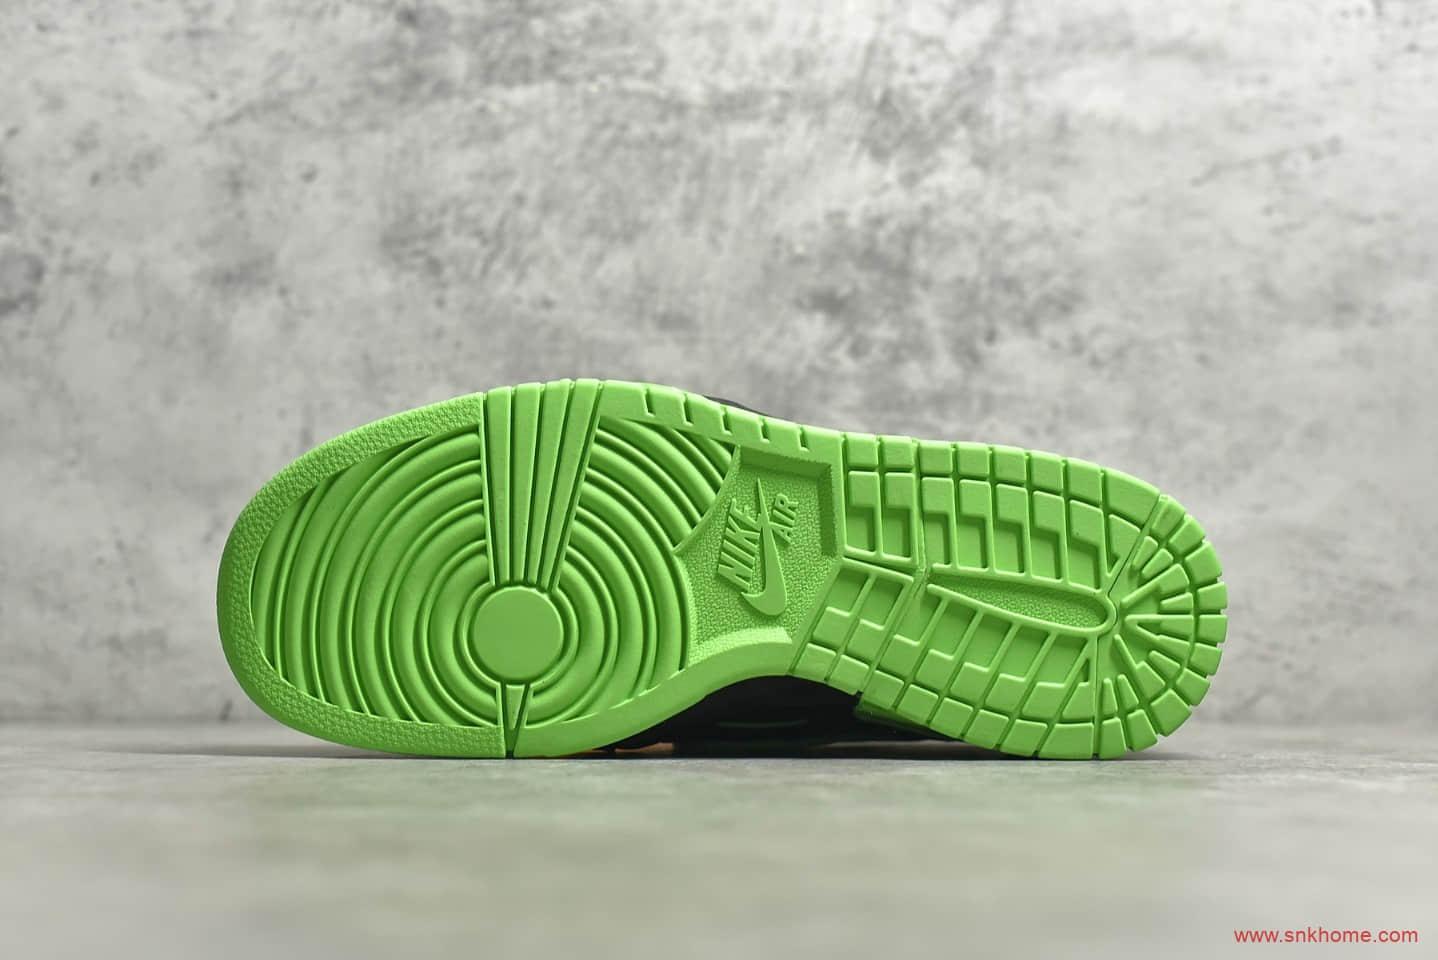 耐克Dunk SB OW联名款黑绿色 Off-White x NIKE Air Rubber Dunk